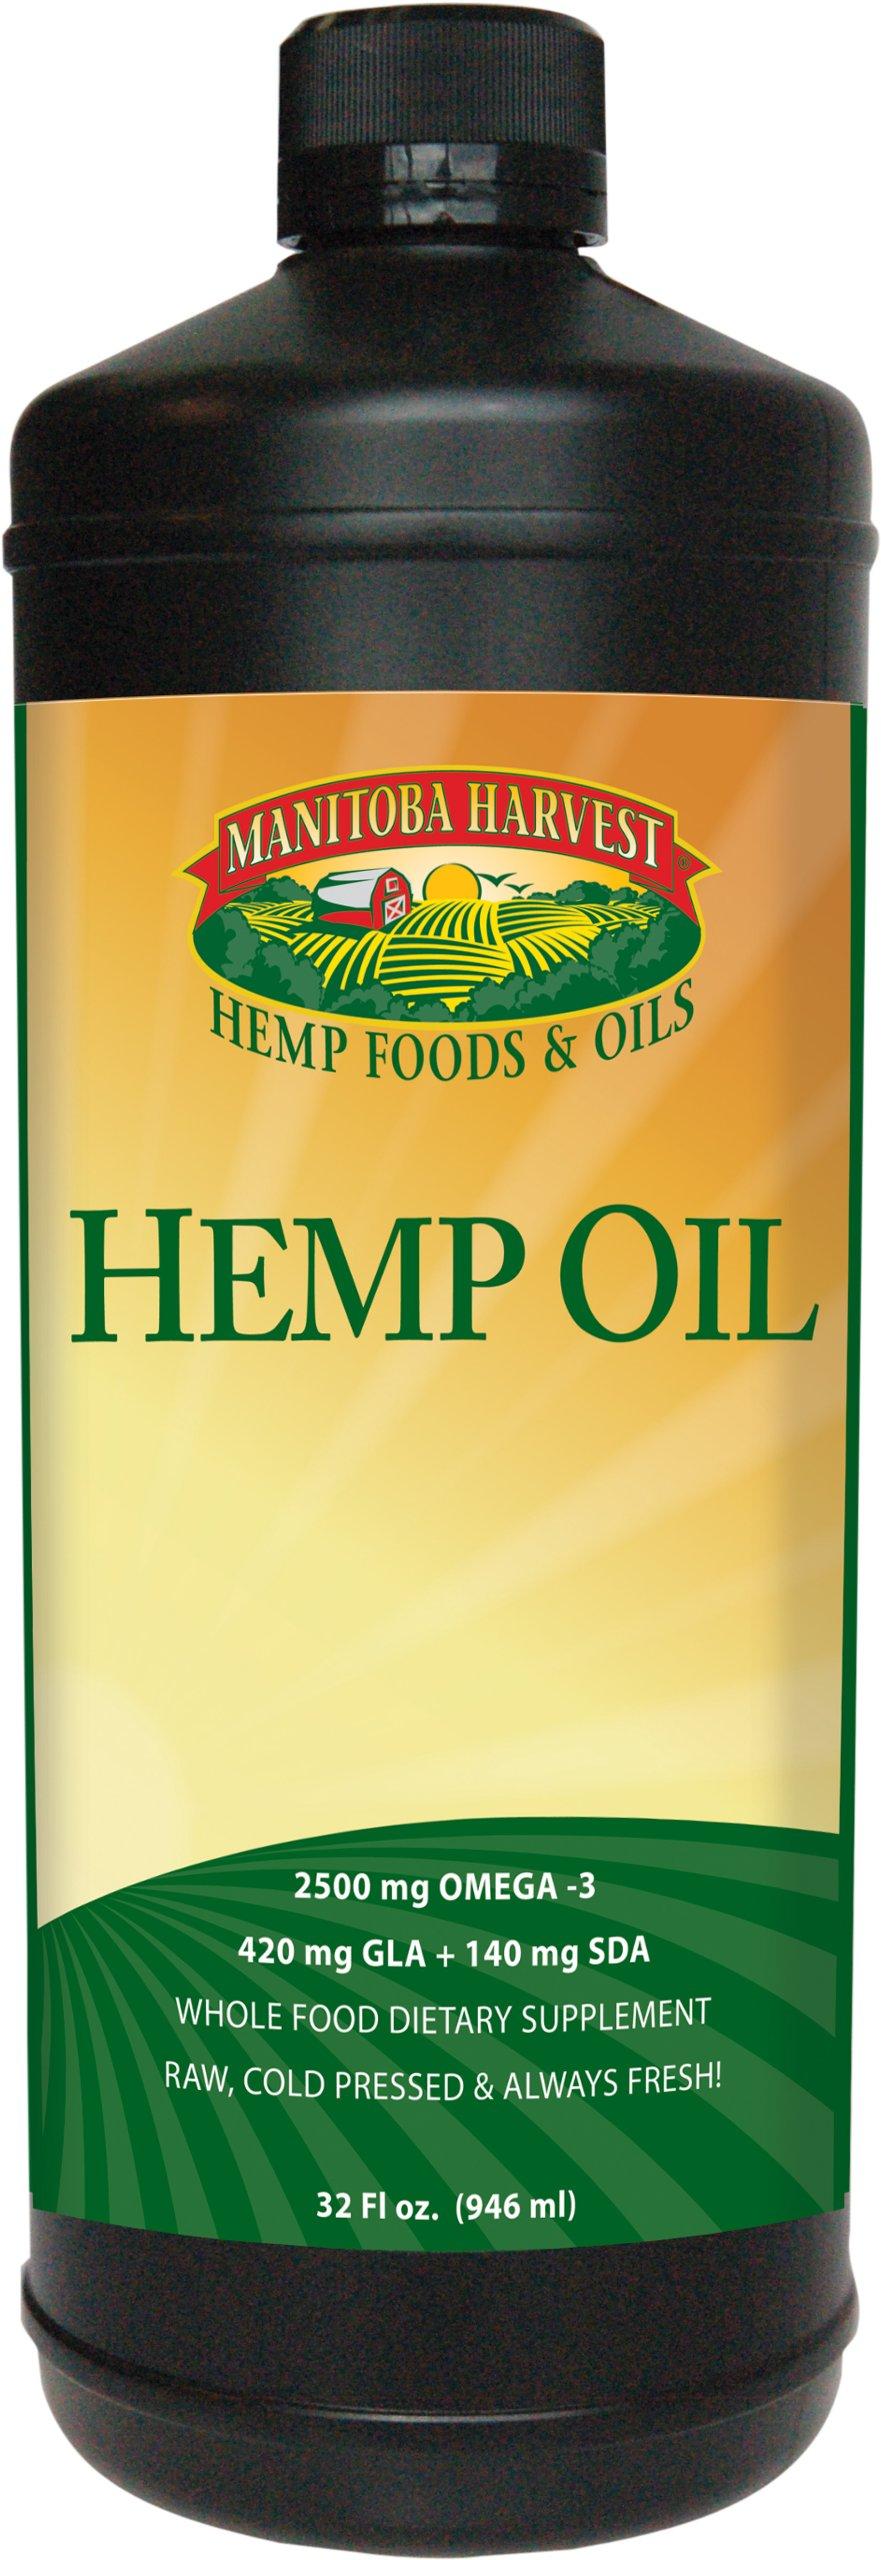 Manitoba Harvest Cold Pressed Hemp Seed Oil, 32 fl. oz., 10g of Omegas per Serving, Non-GMO